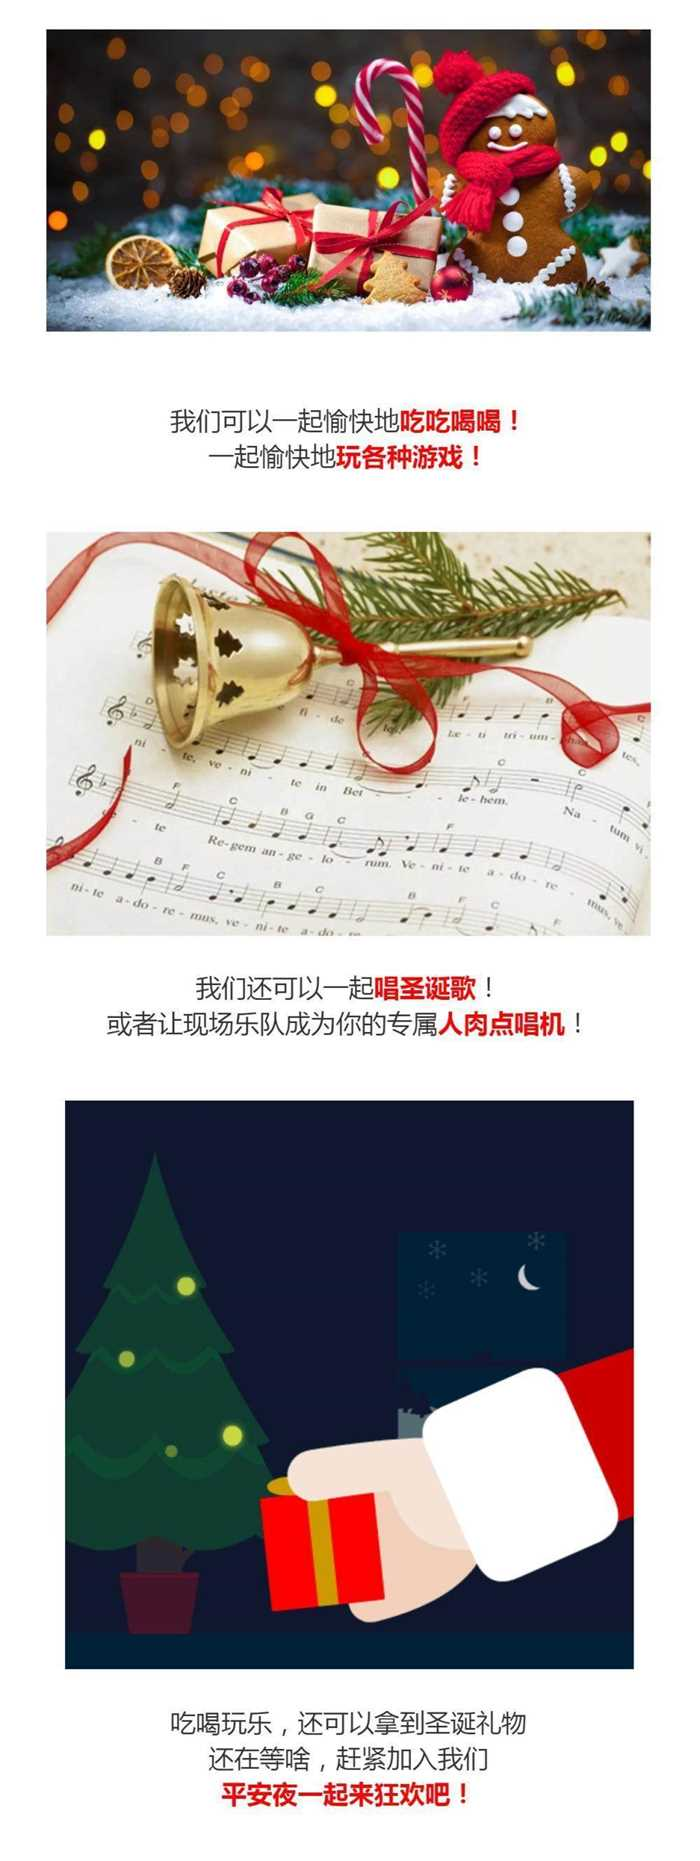 www.huodongxing.com_event_3417860329000(iPhone 6 Plus)1.jpg